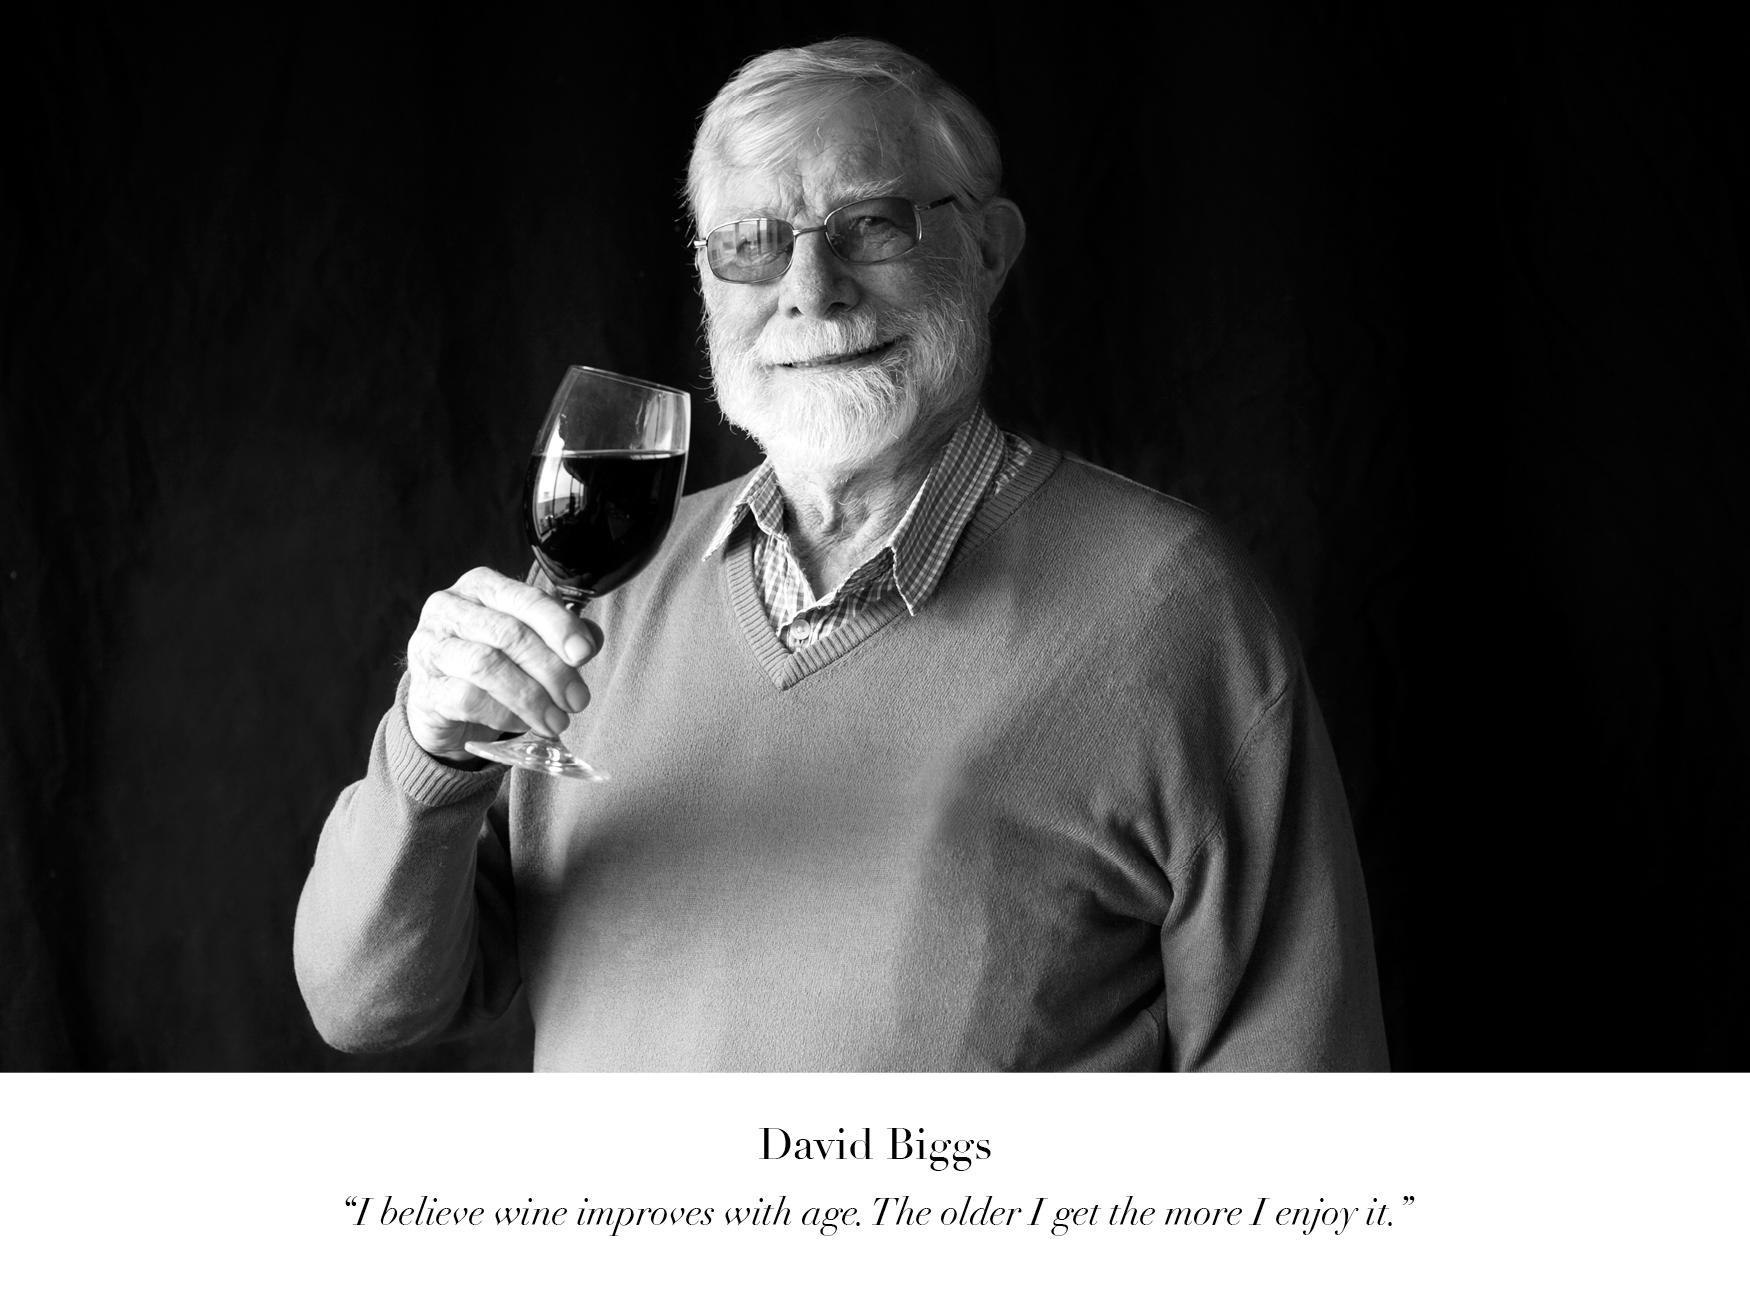 David Biggs Wine of the Month Club wine judge